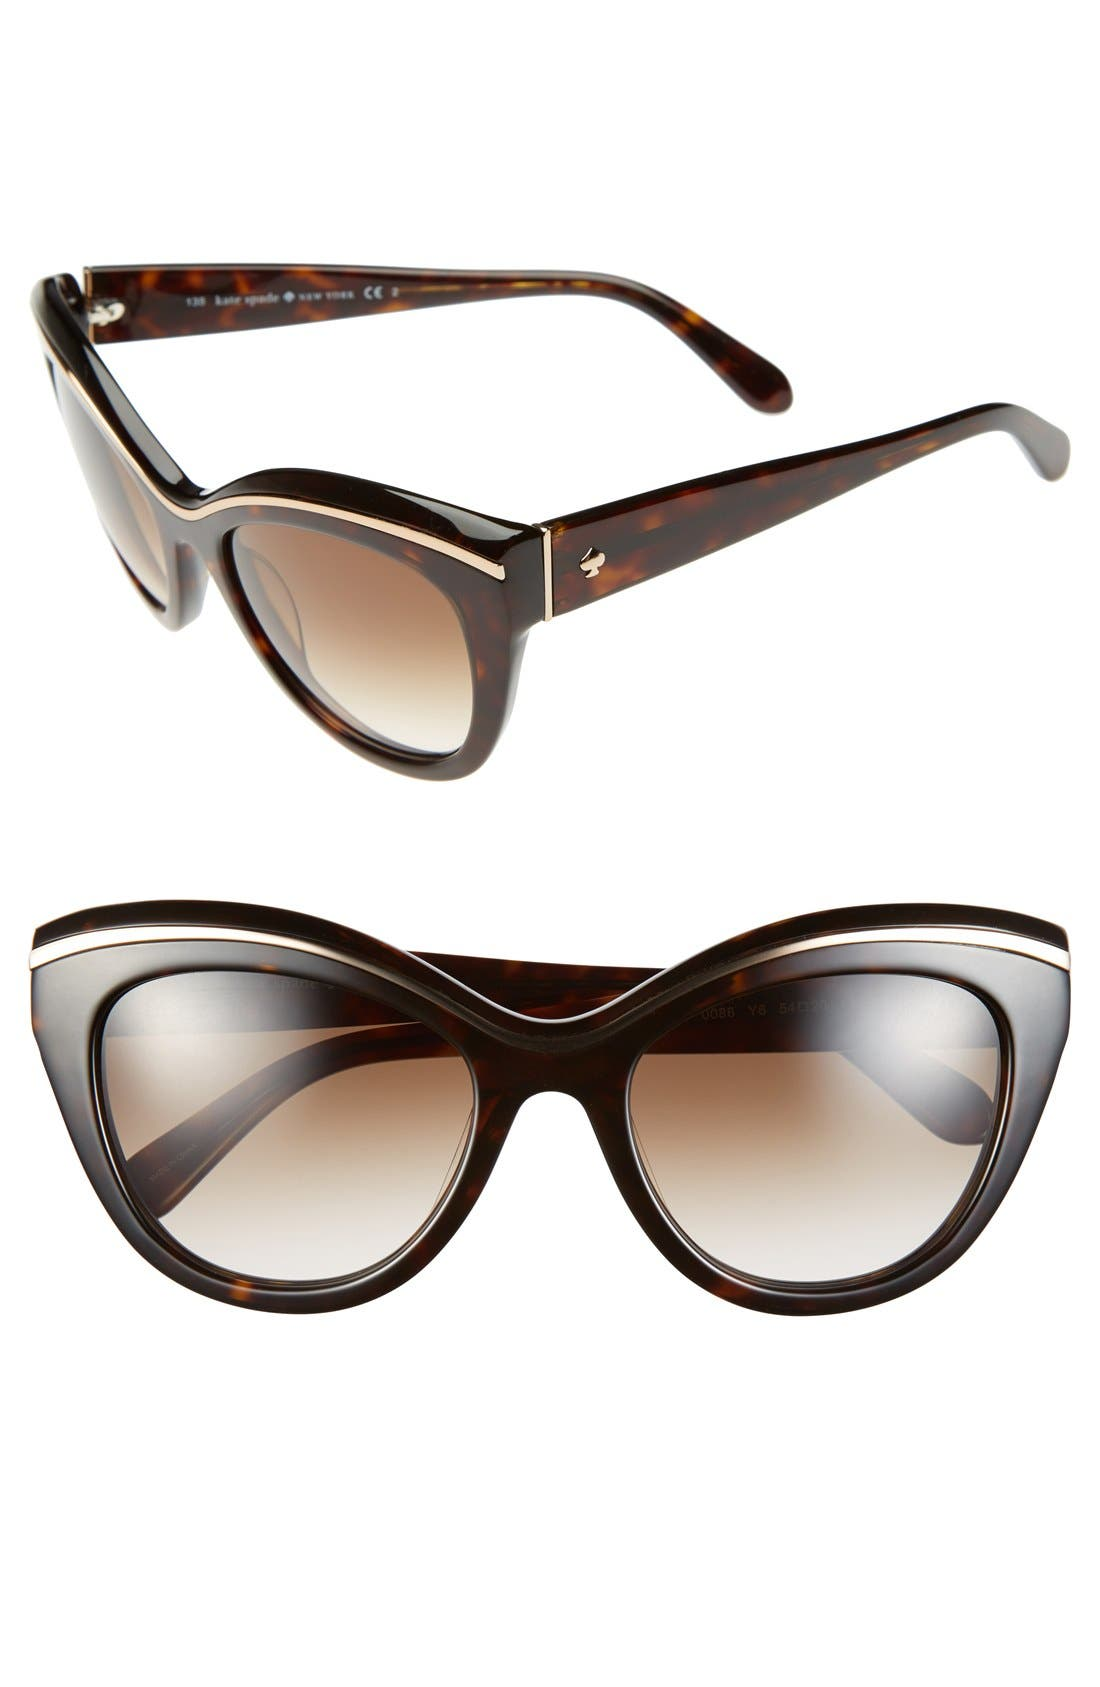 Main Image - kate spade new york 54mm cat eye sunglasses